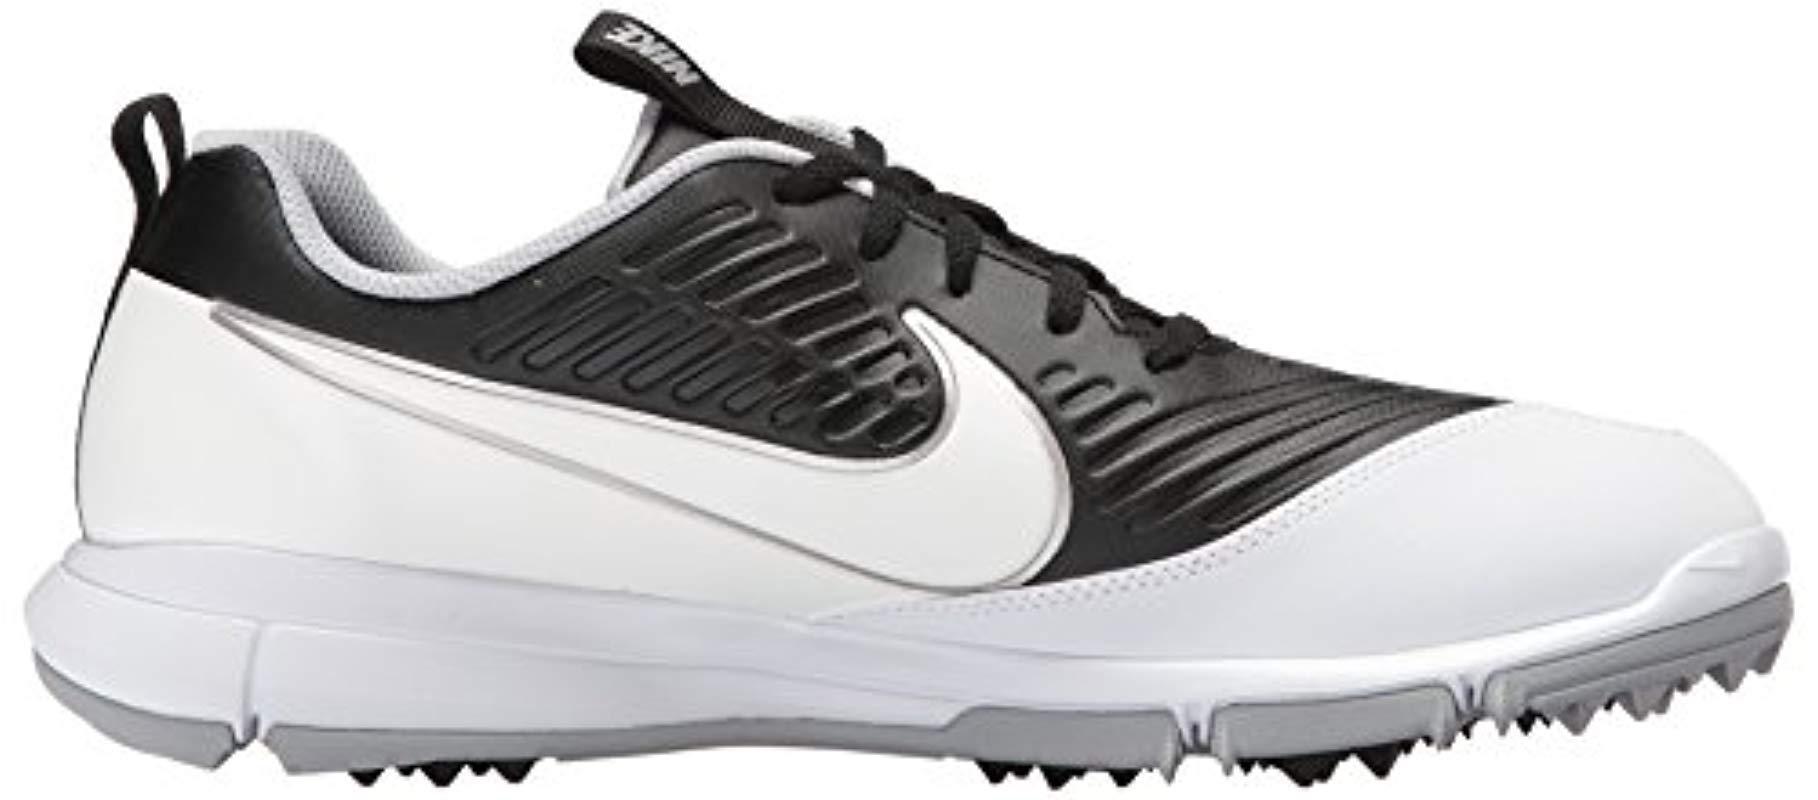 check out 1e81e b5c18 Lyst - Leggings pour femme Squad Nike